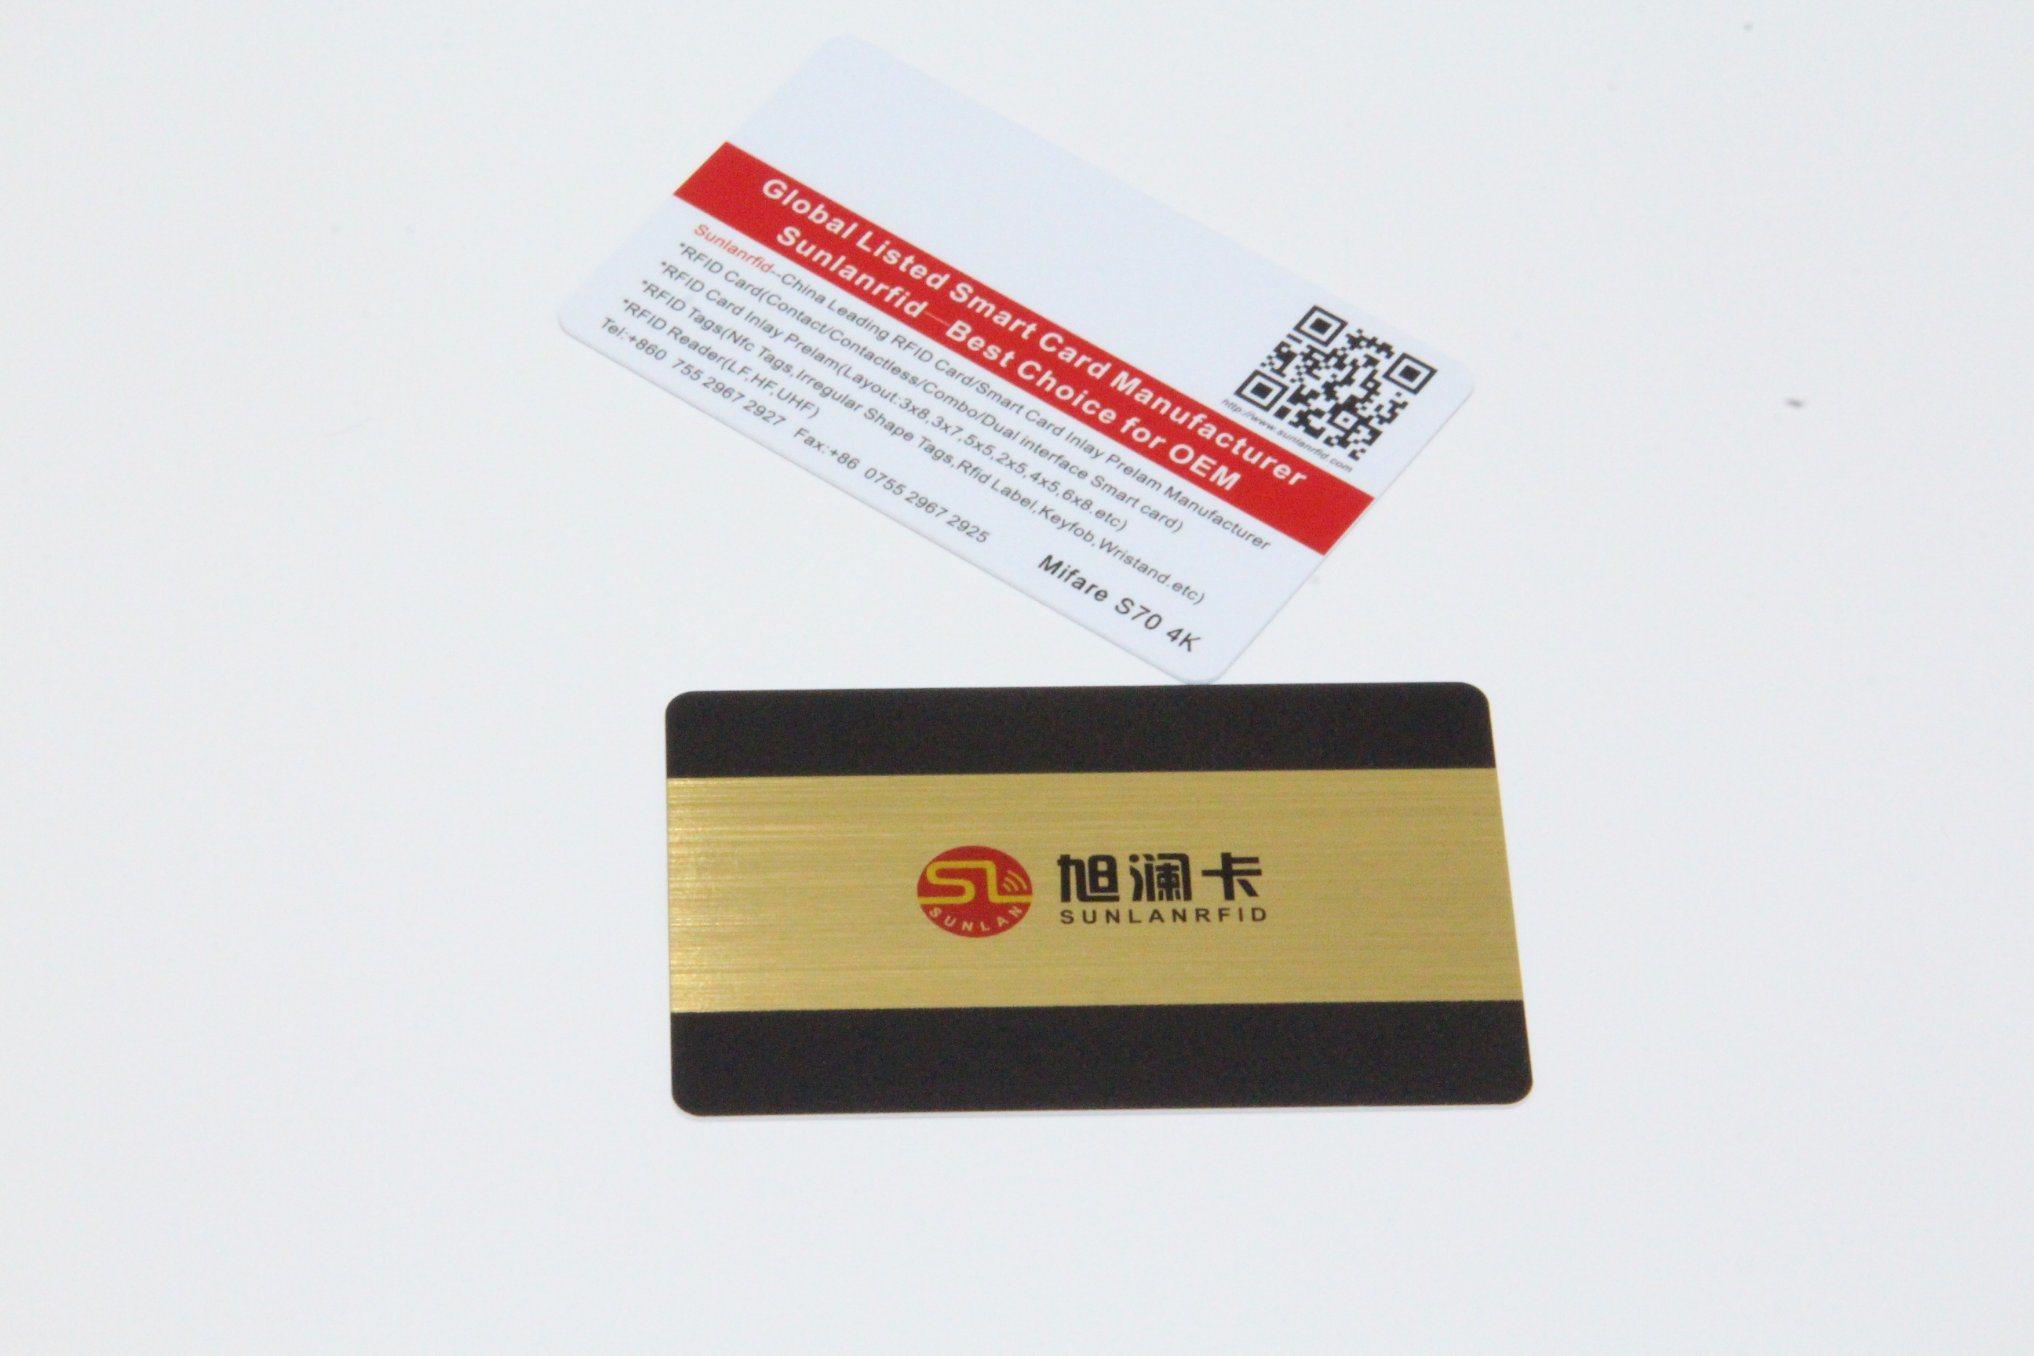 RFID 125kHz Proximity Smart Card / NFC Magnetic Strip Hotel Key Card / PVC Contact IC Card